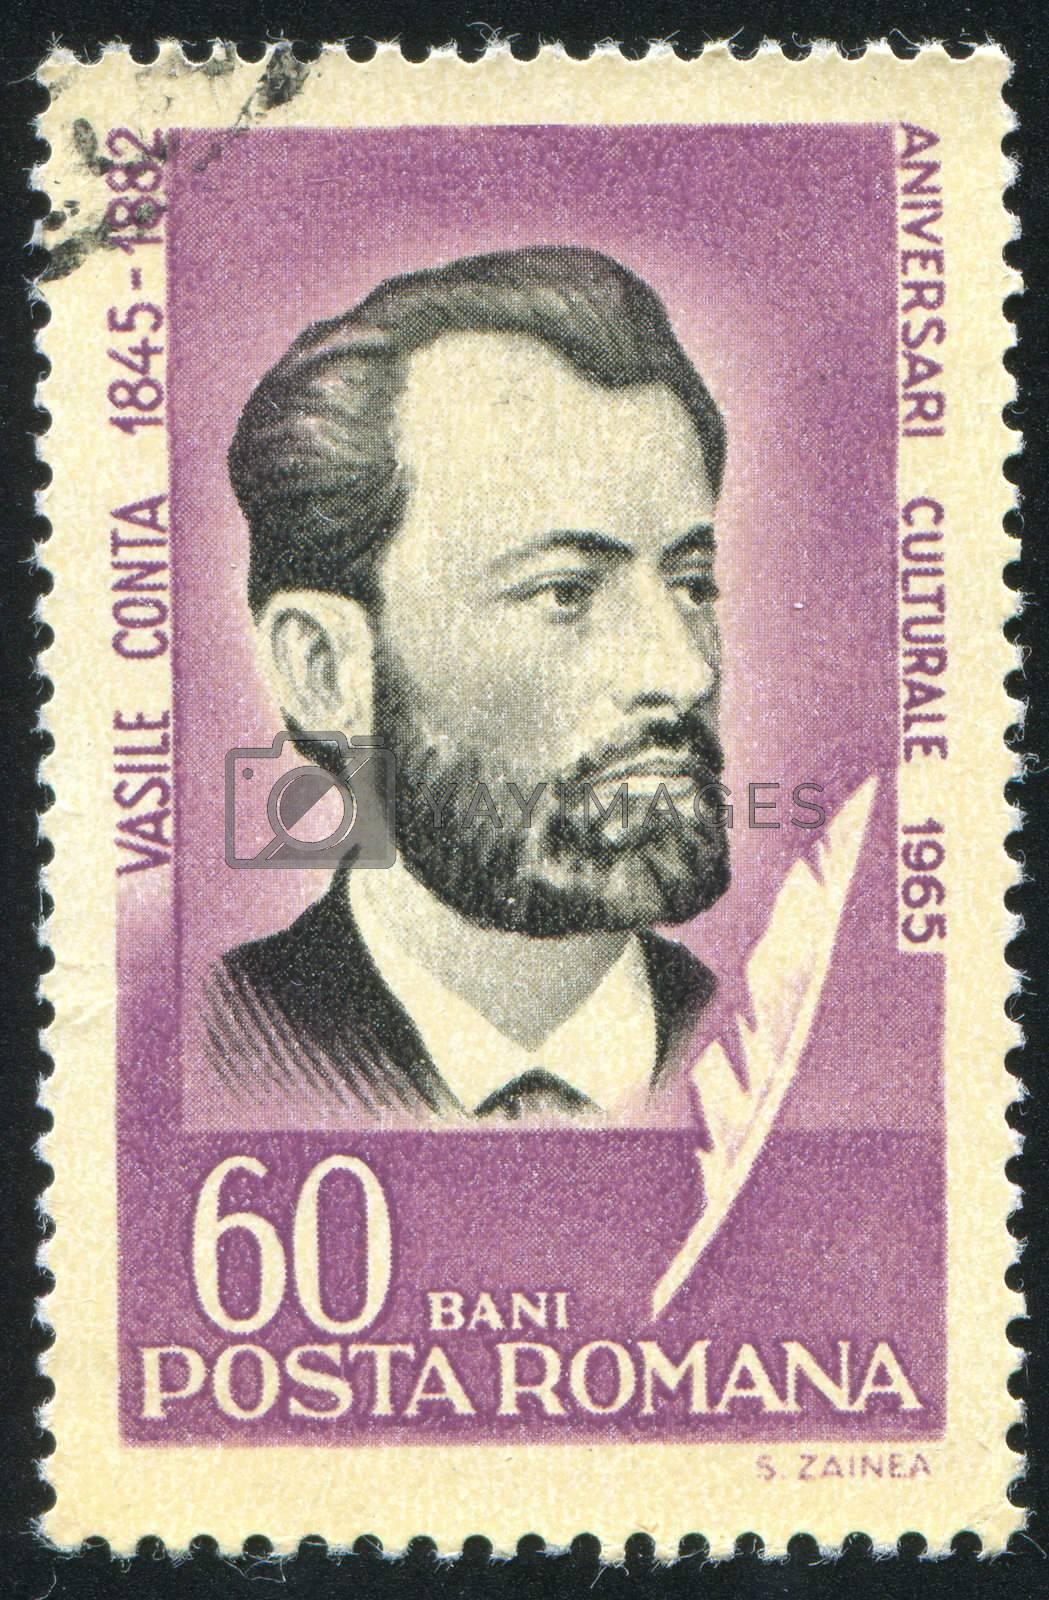 ROMANIA - CIRCA 1965: stamp printed by Romania, show Vasile Conta, philosopher, circa 1965.